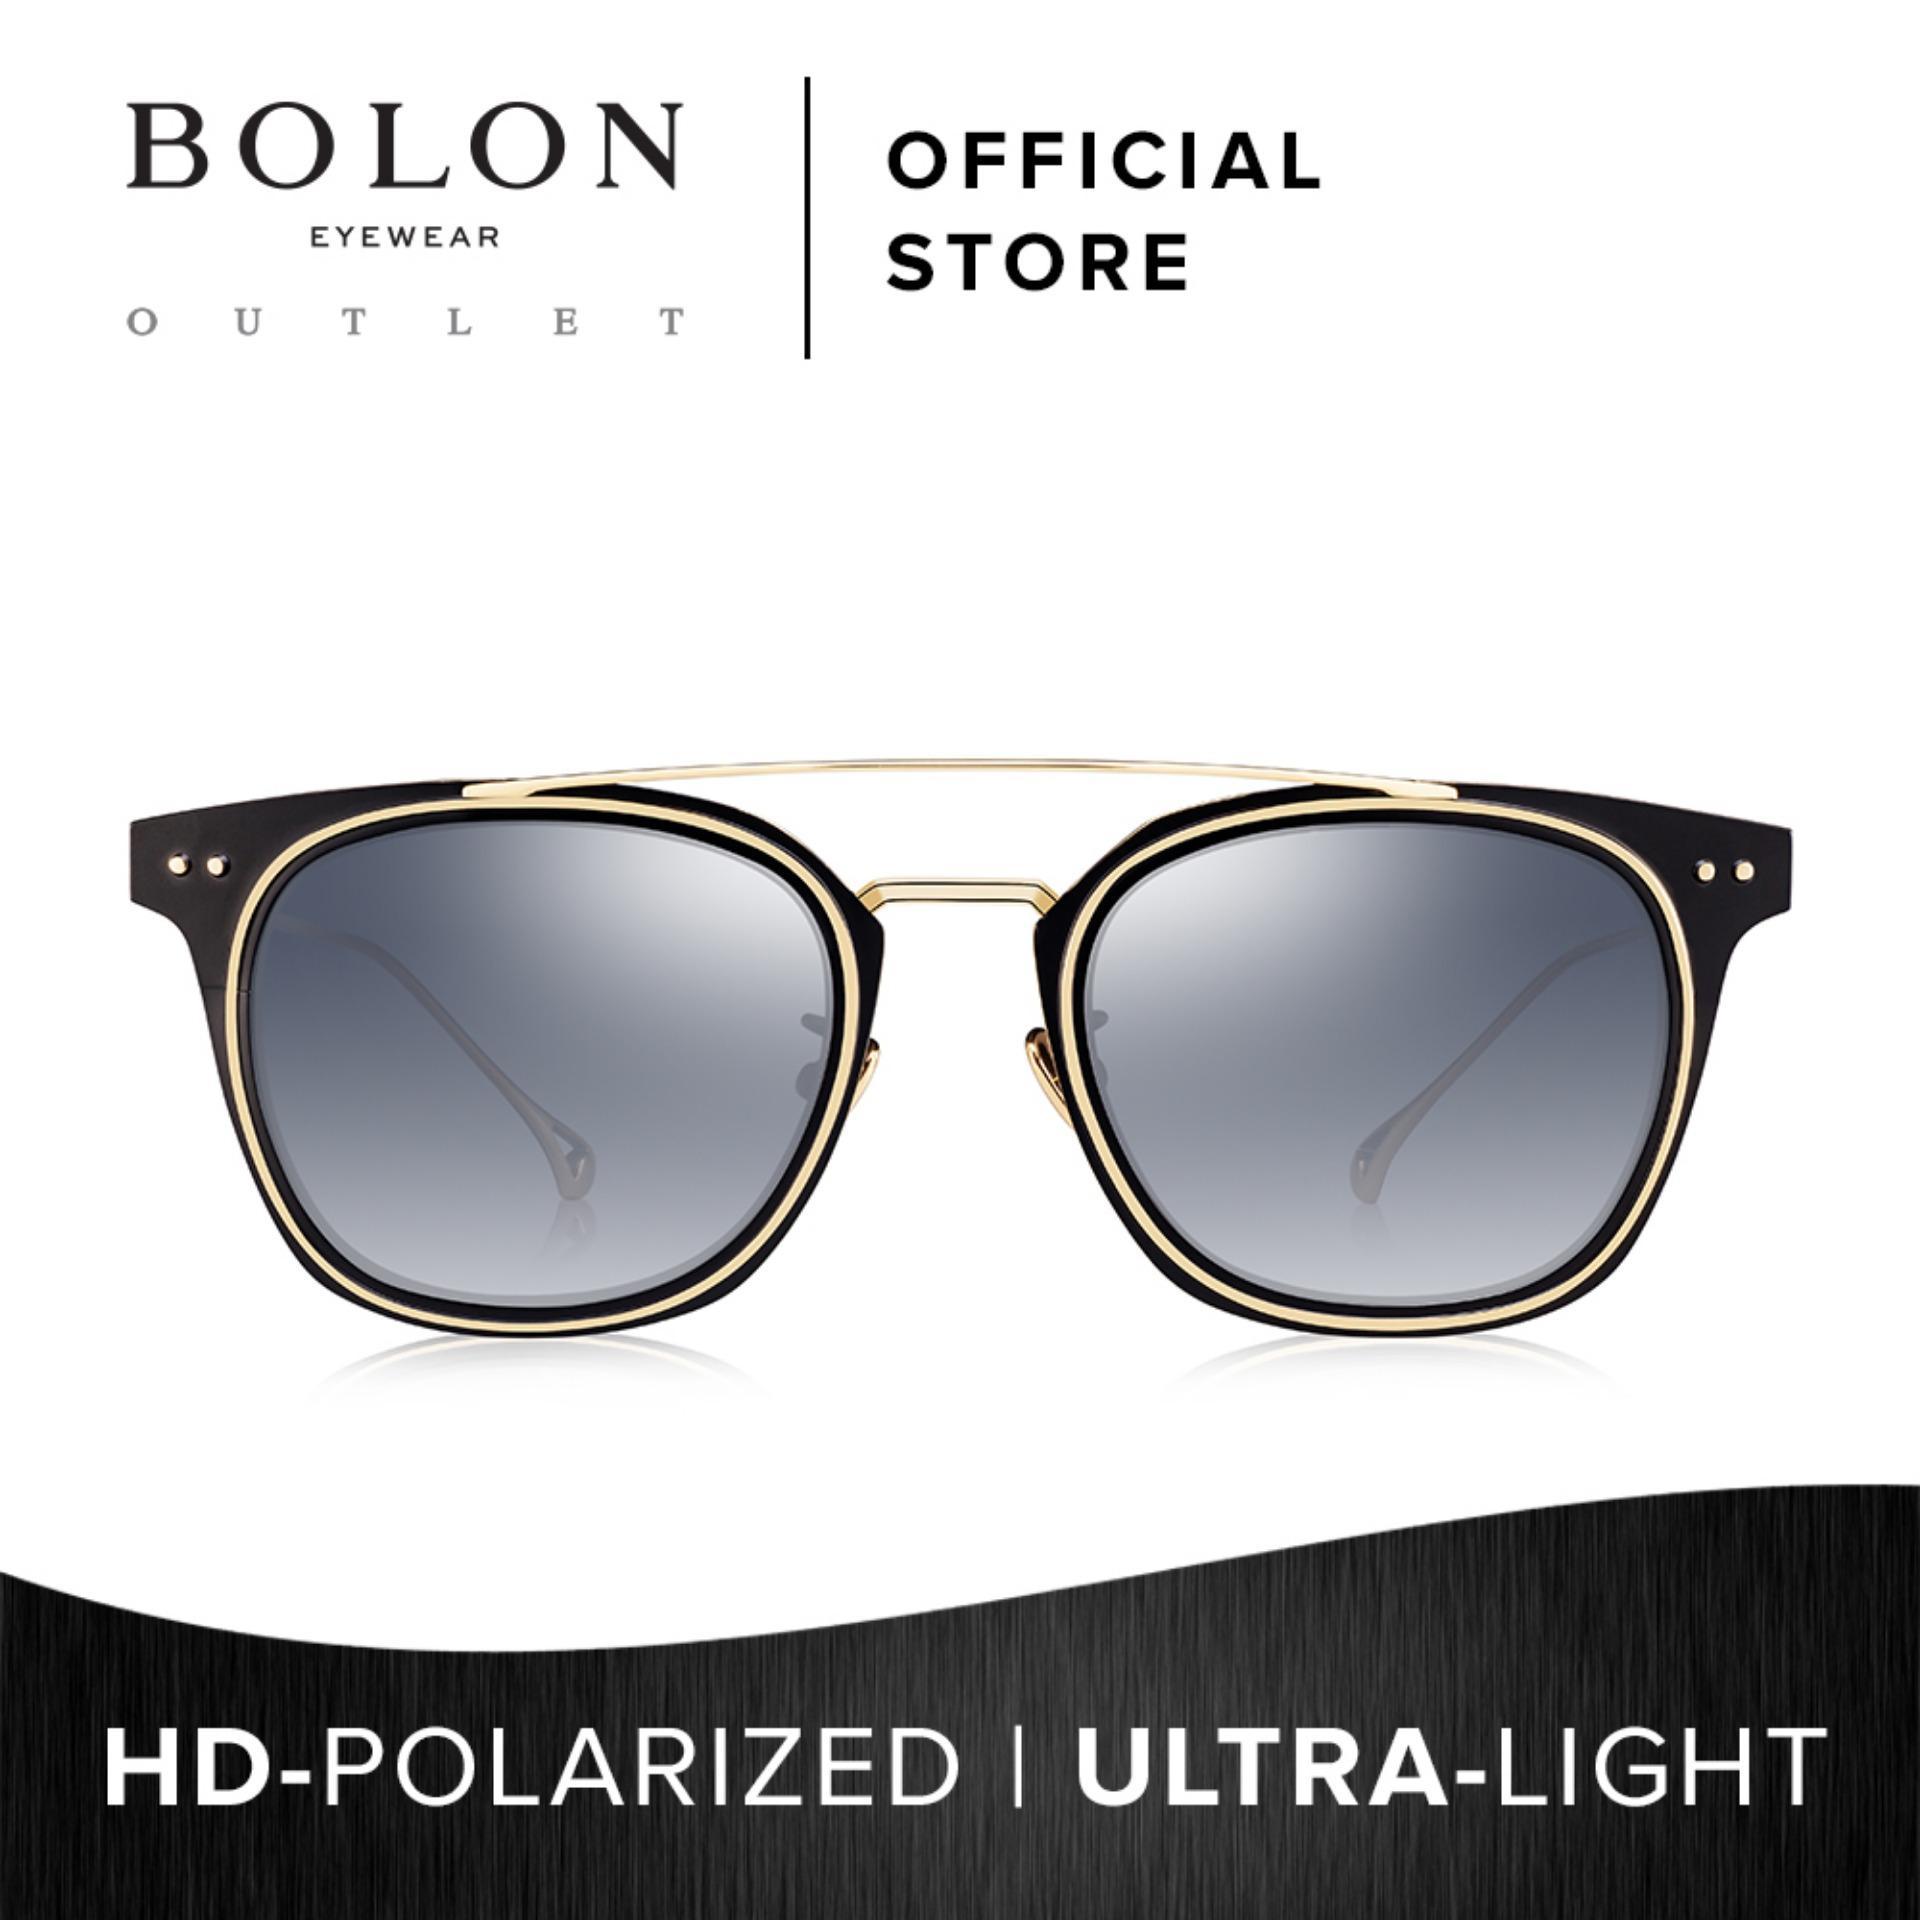 50d8d38ee4c BOLON Eyewear Unisex Polarized Square Sunglasses Larry BV1003 Black Gold